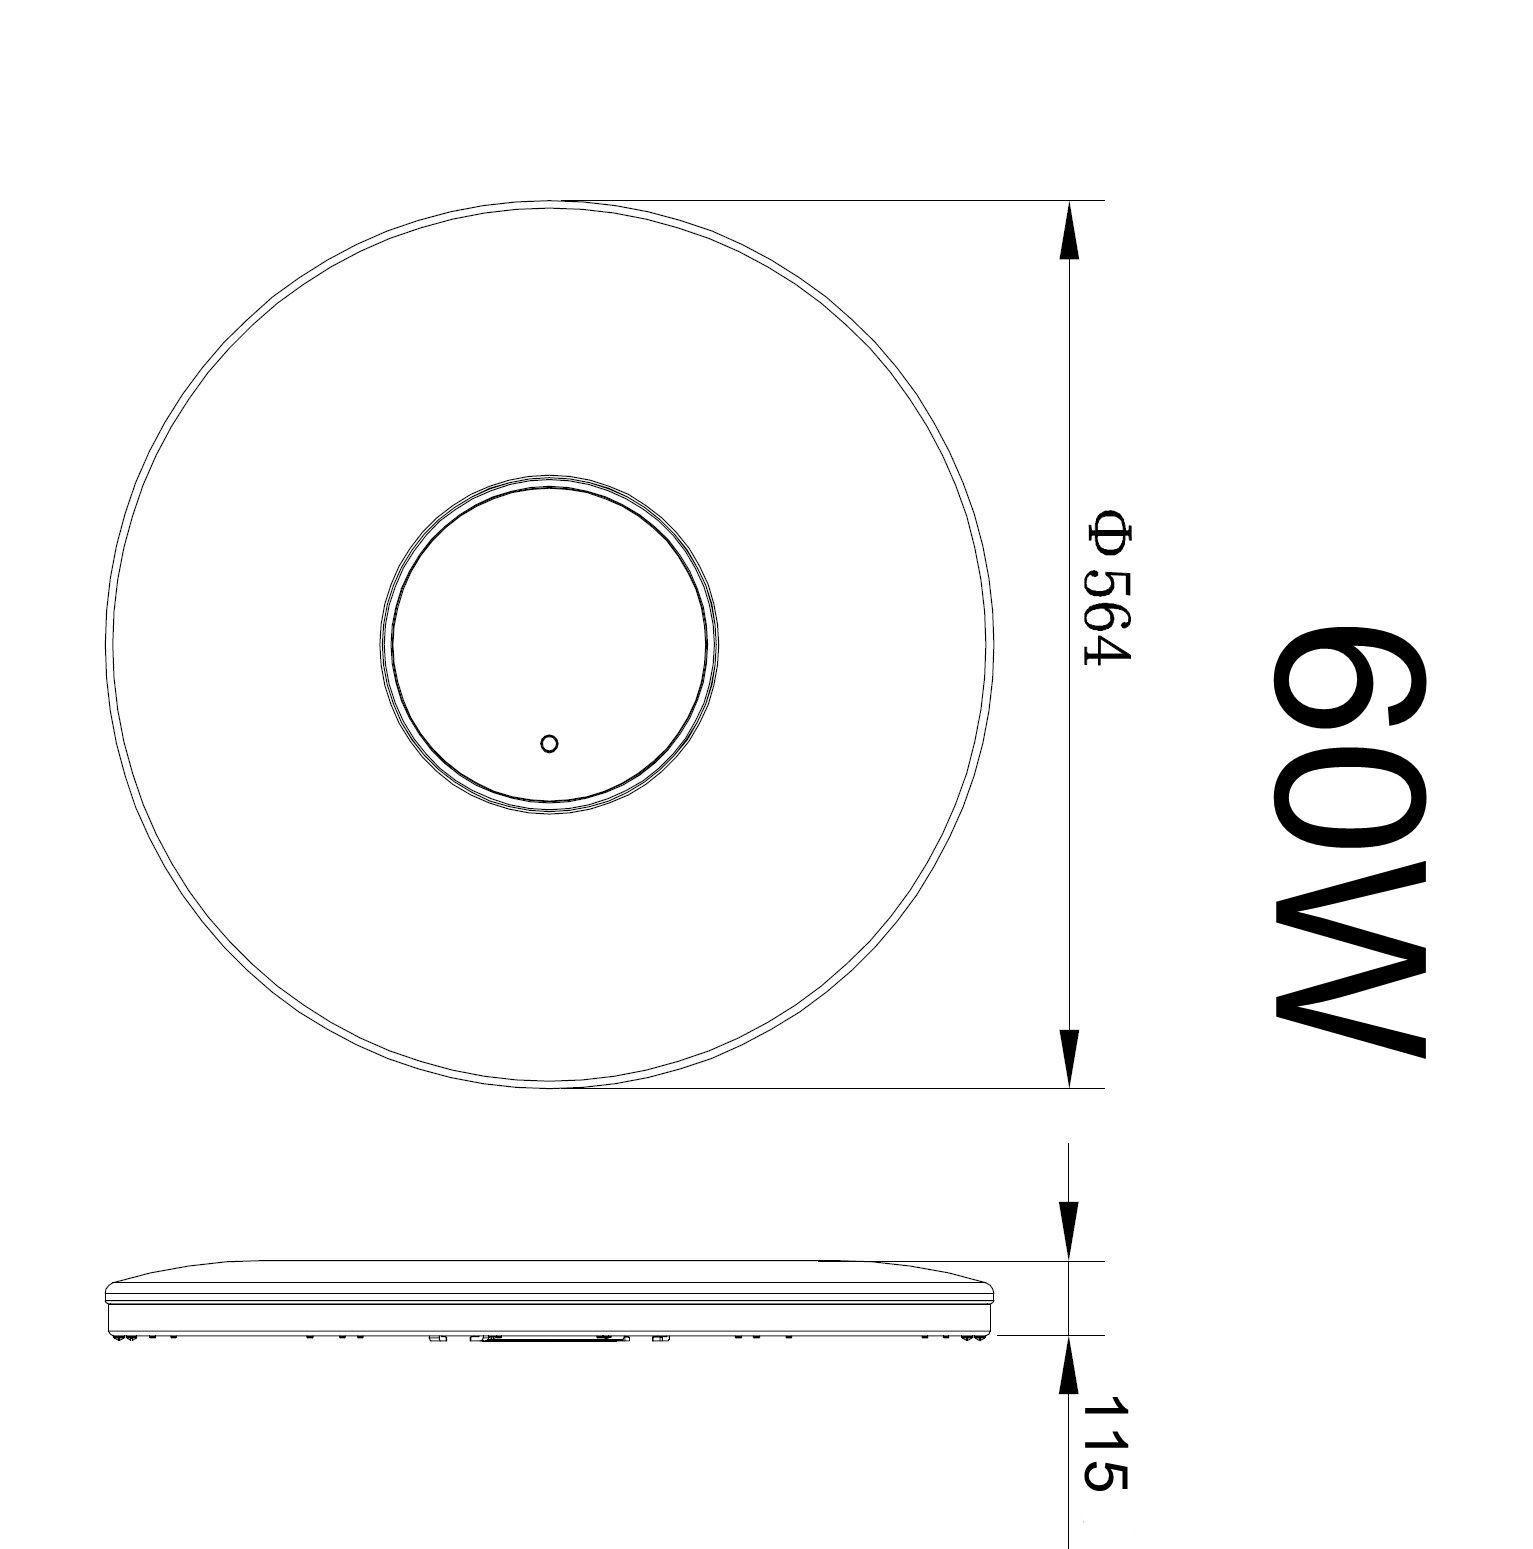 led deckenlampe wandlampe deckenleuchte dimmbar 60 40w. Black Bedroom Furniture Sets. Home Design Ideas